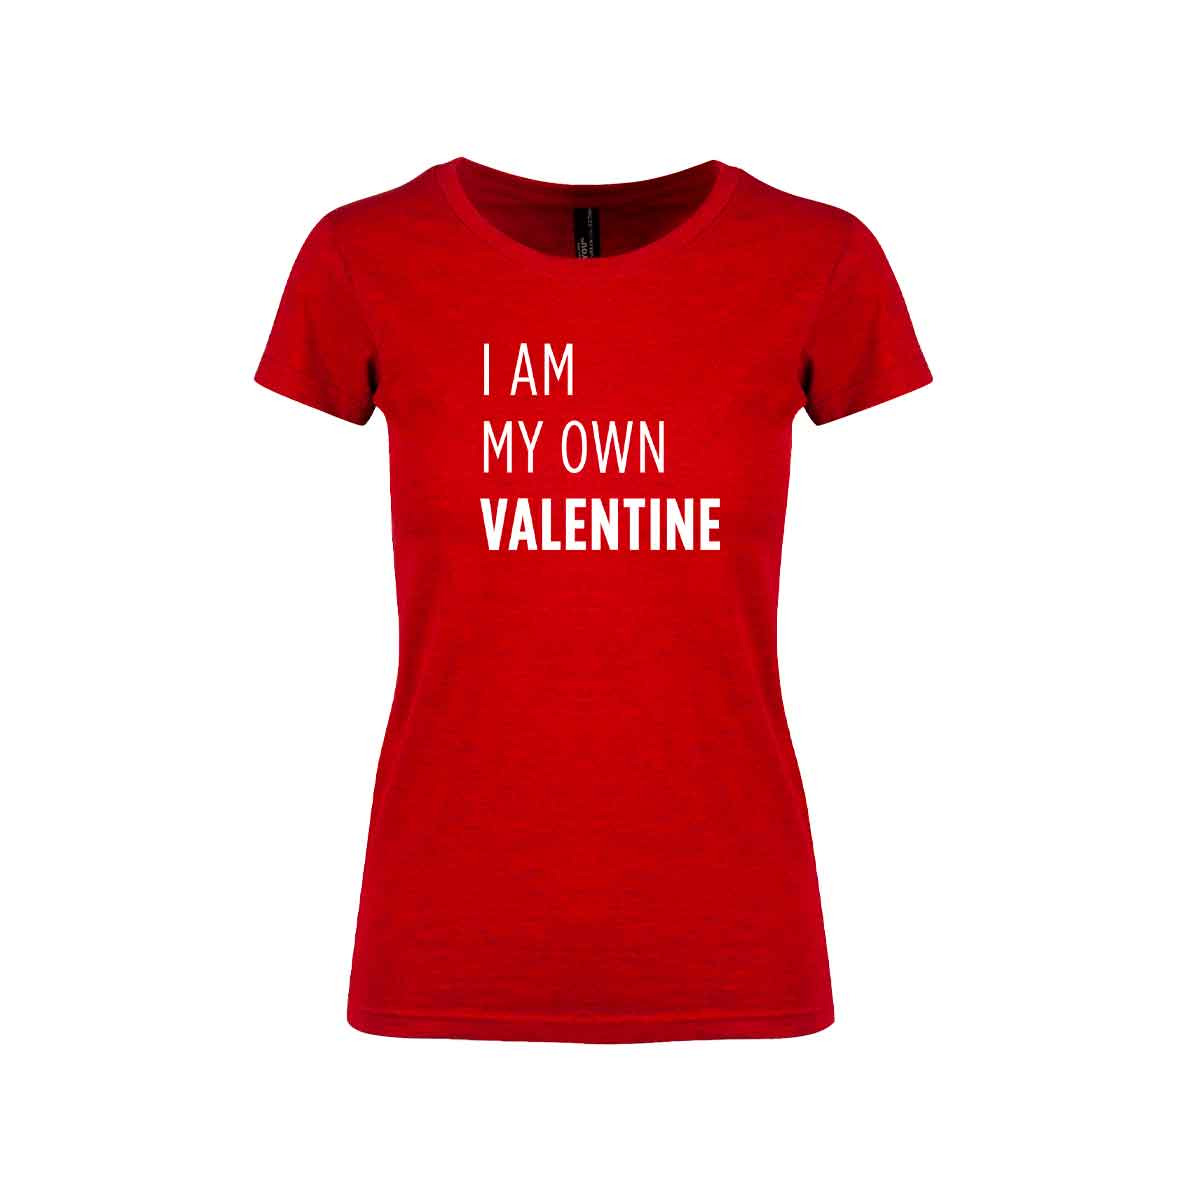 "Rød t-skjorte fra YouBrands med fluoriserende trykk ""I am my own Valentine"""